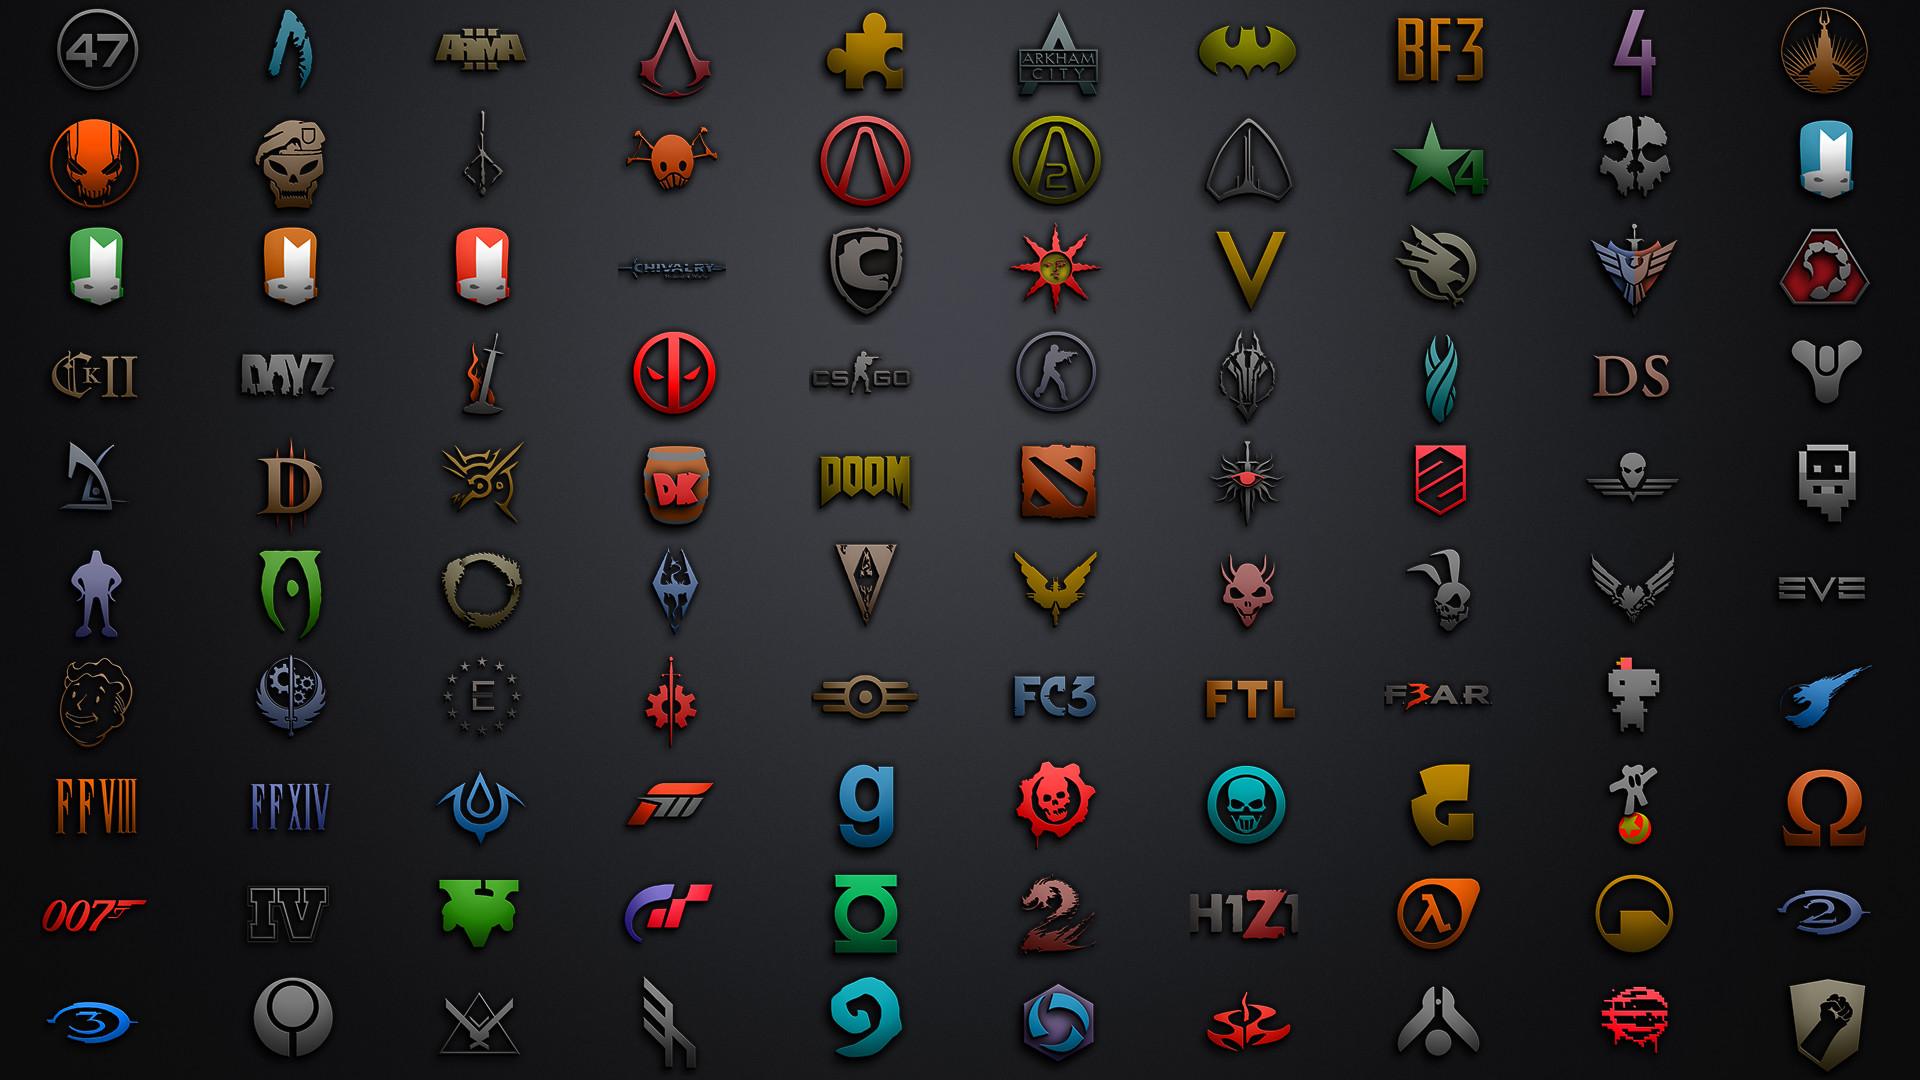 gaming wallpaper hd (73+ images)